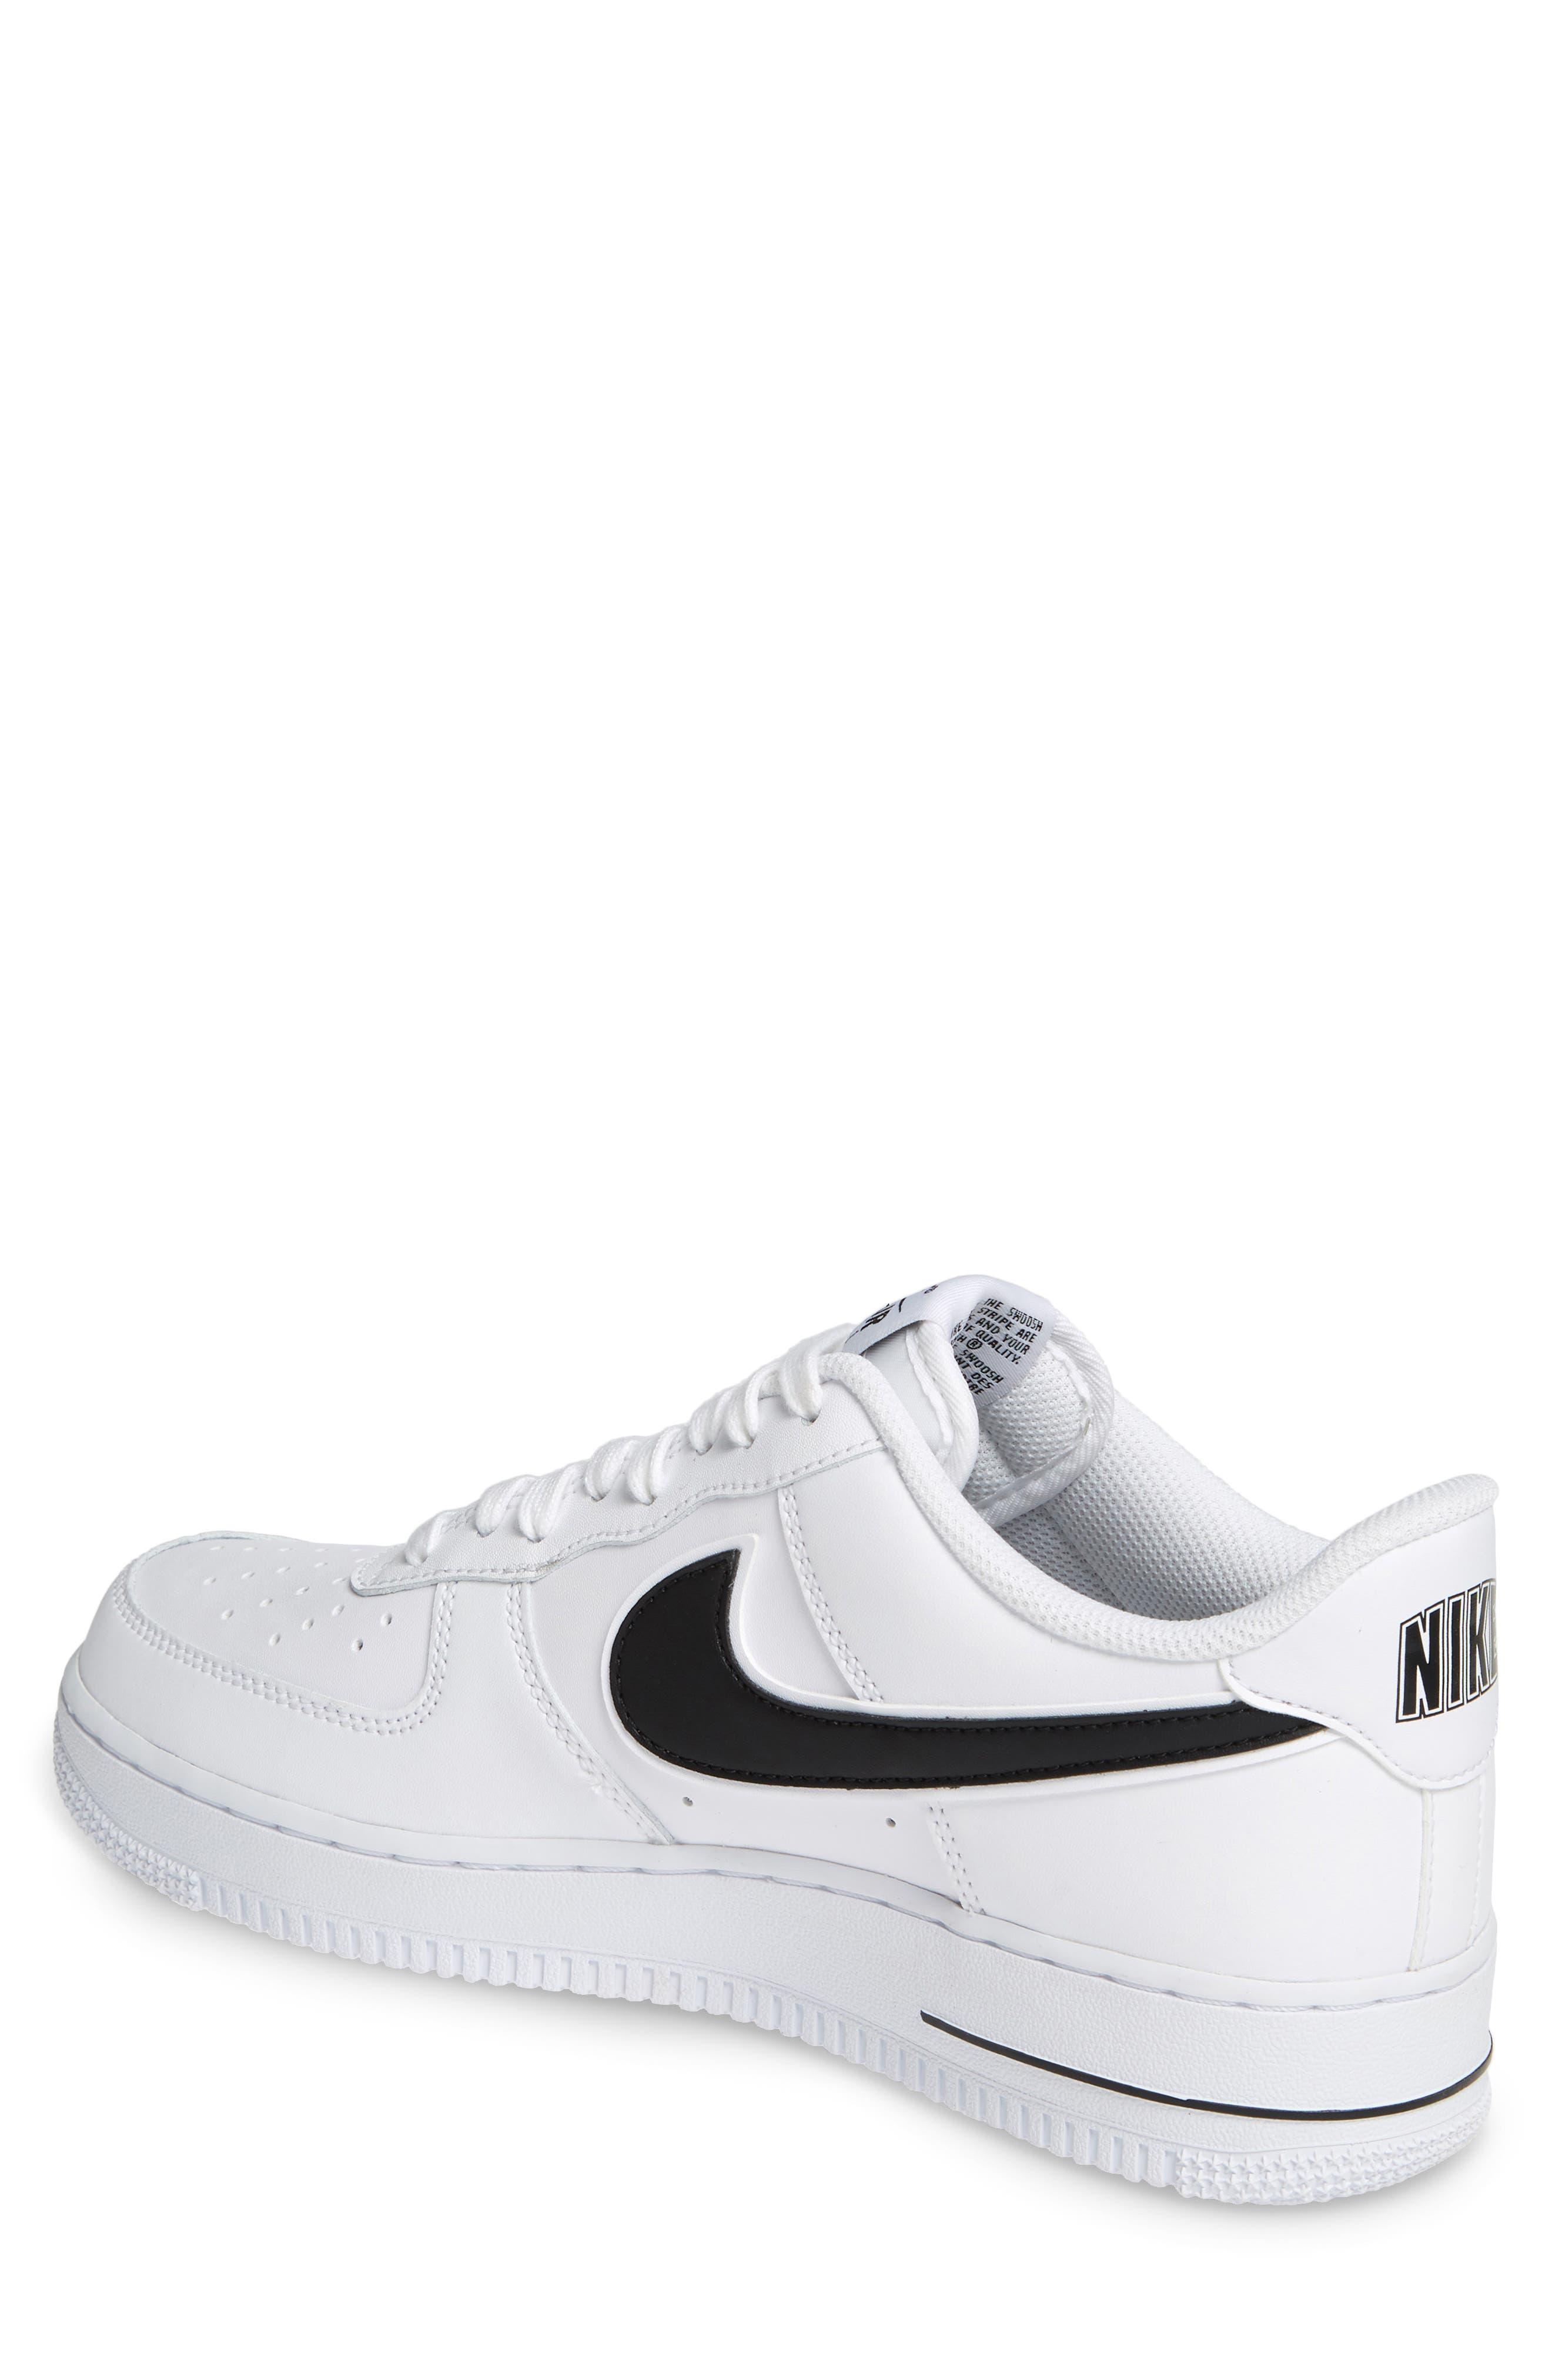 NIKE, Air Force 1 '07 3 Sneaker, Alternate thumbnail 2, color, WHITE/ BLACK